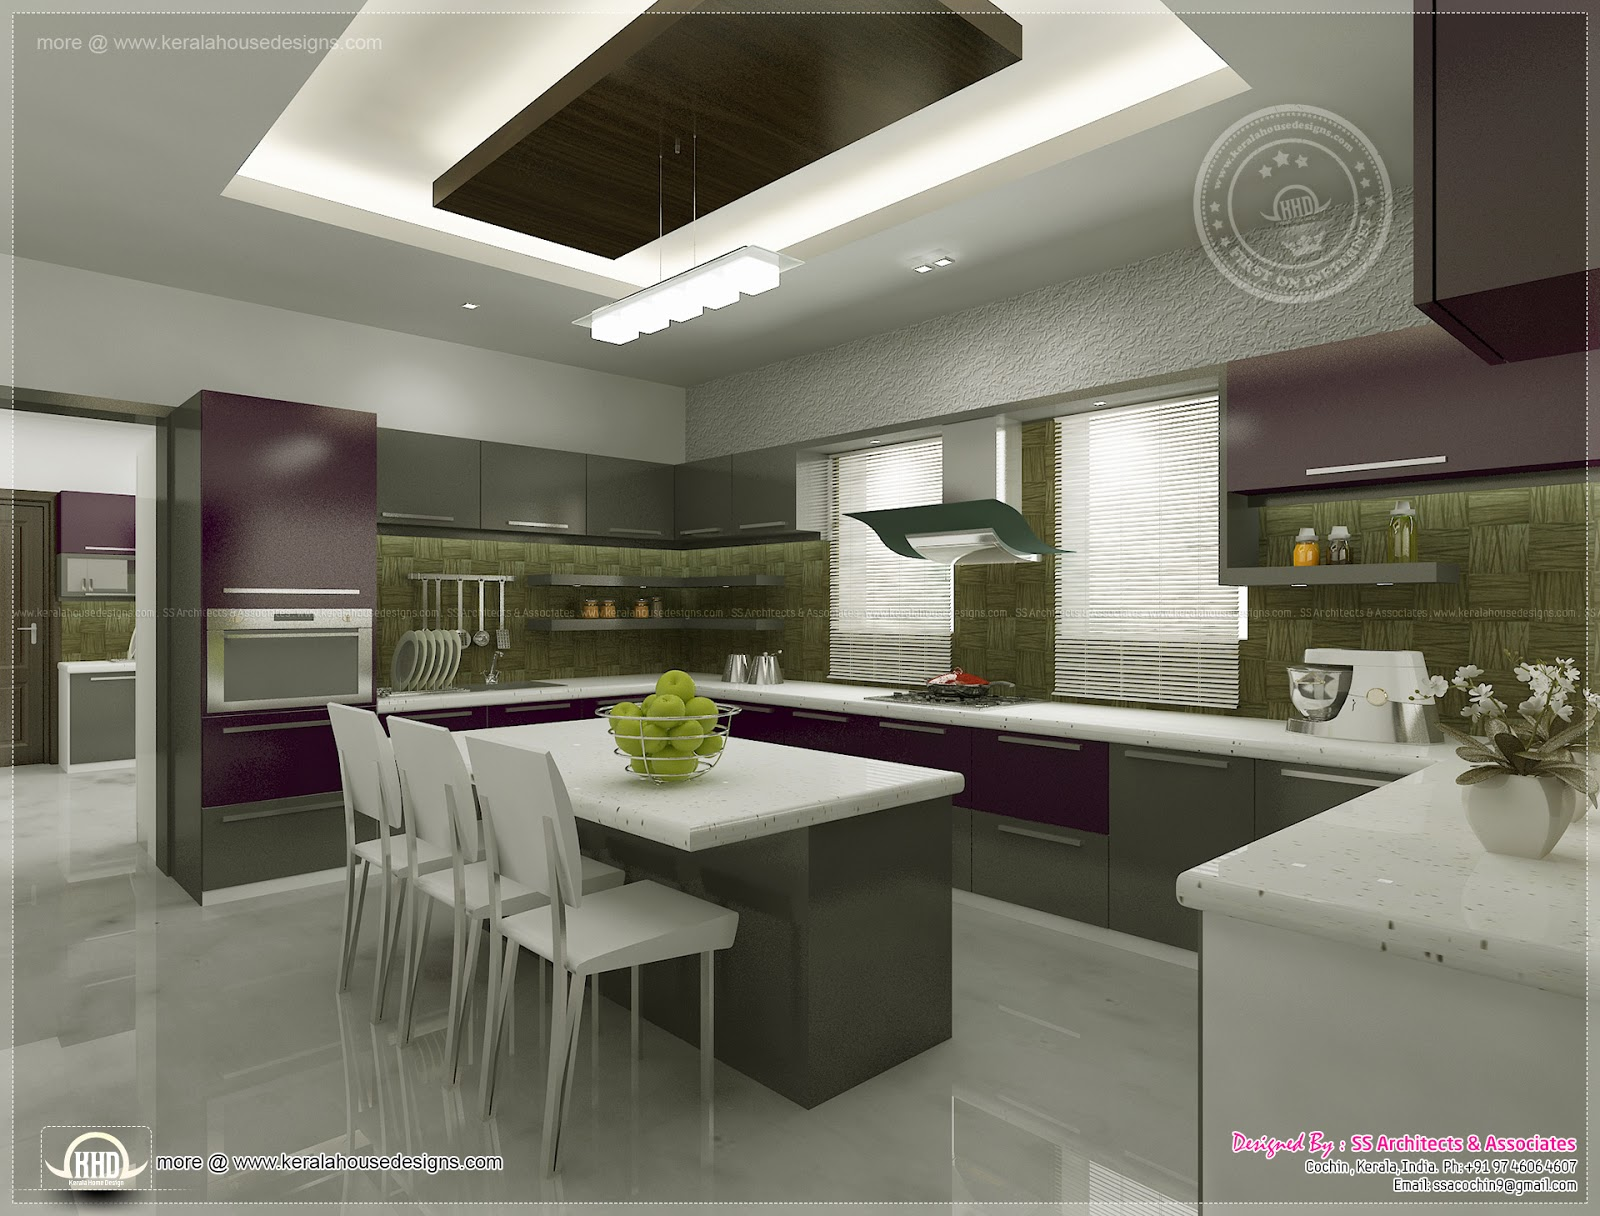 Kitchen interior views by SS Architects, Cochin - Kerala ...